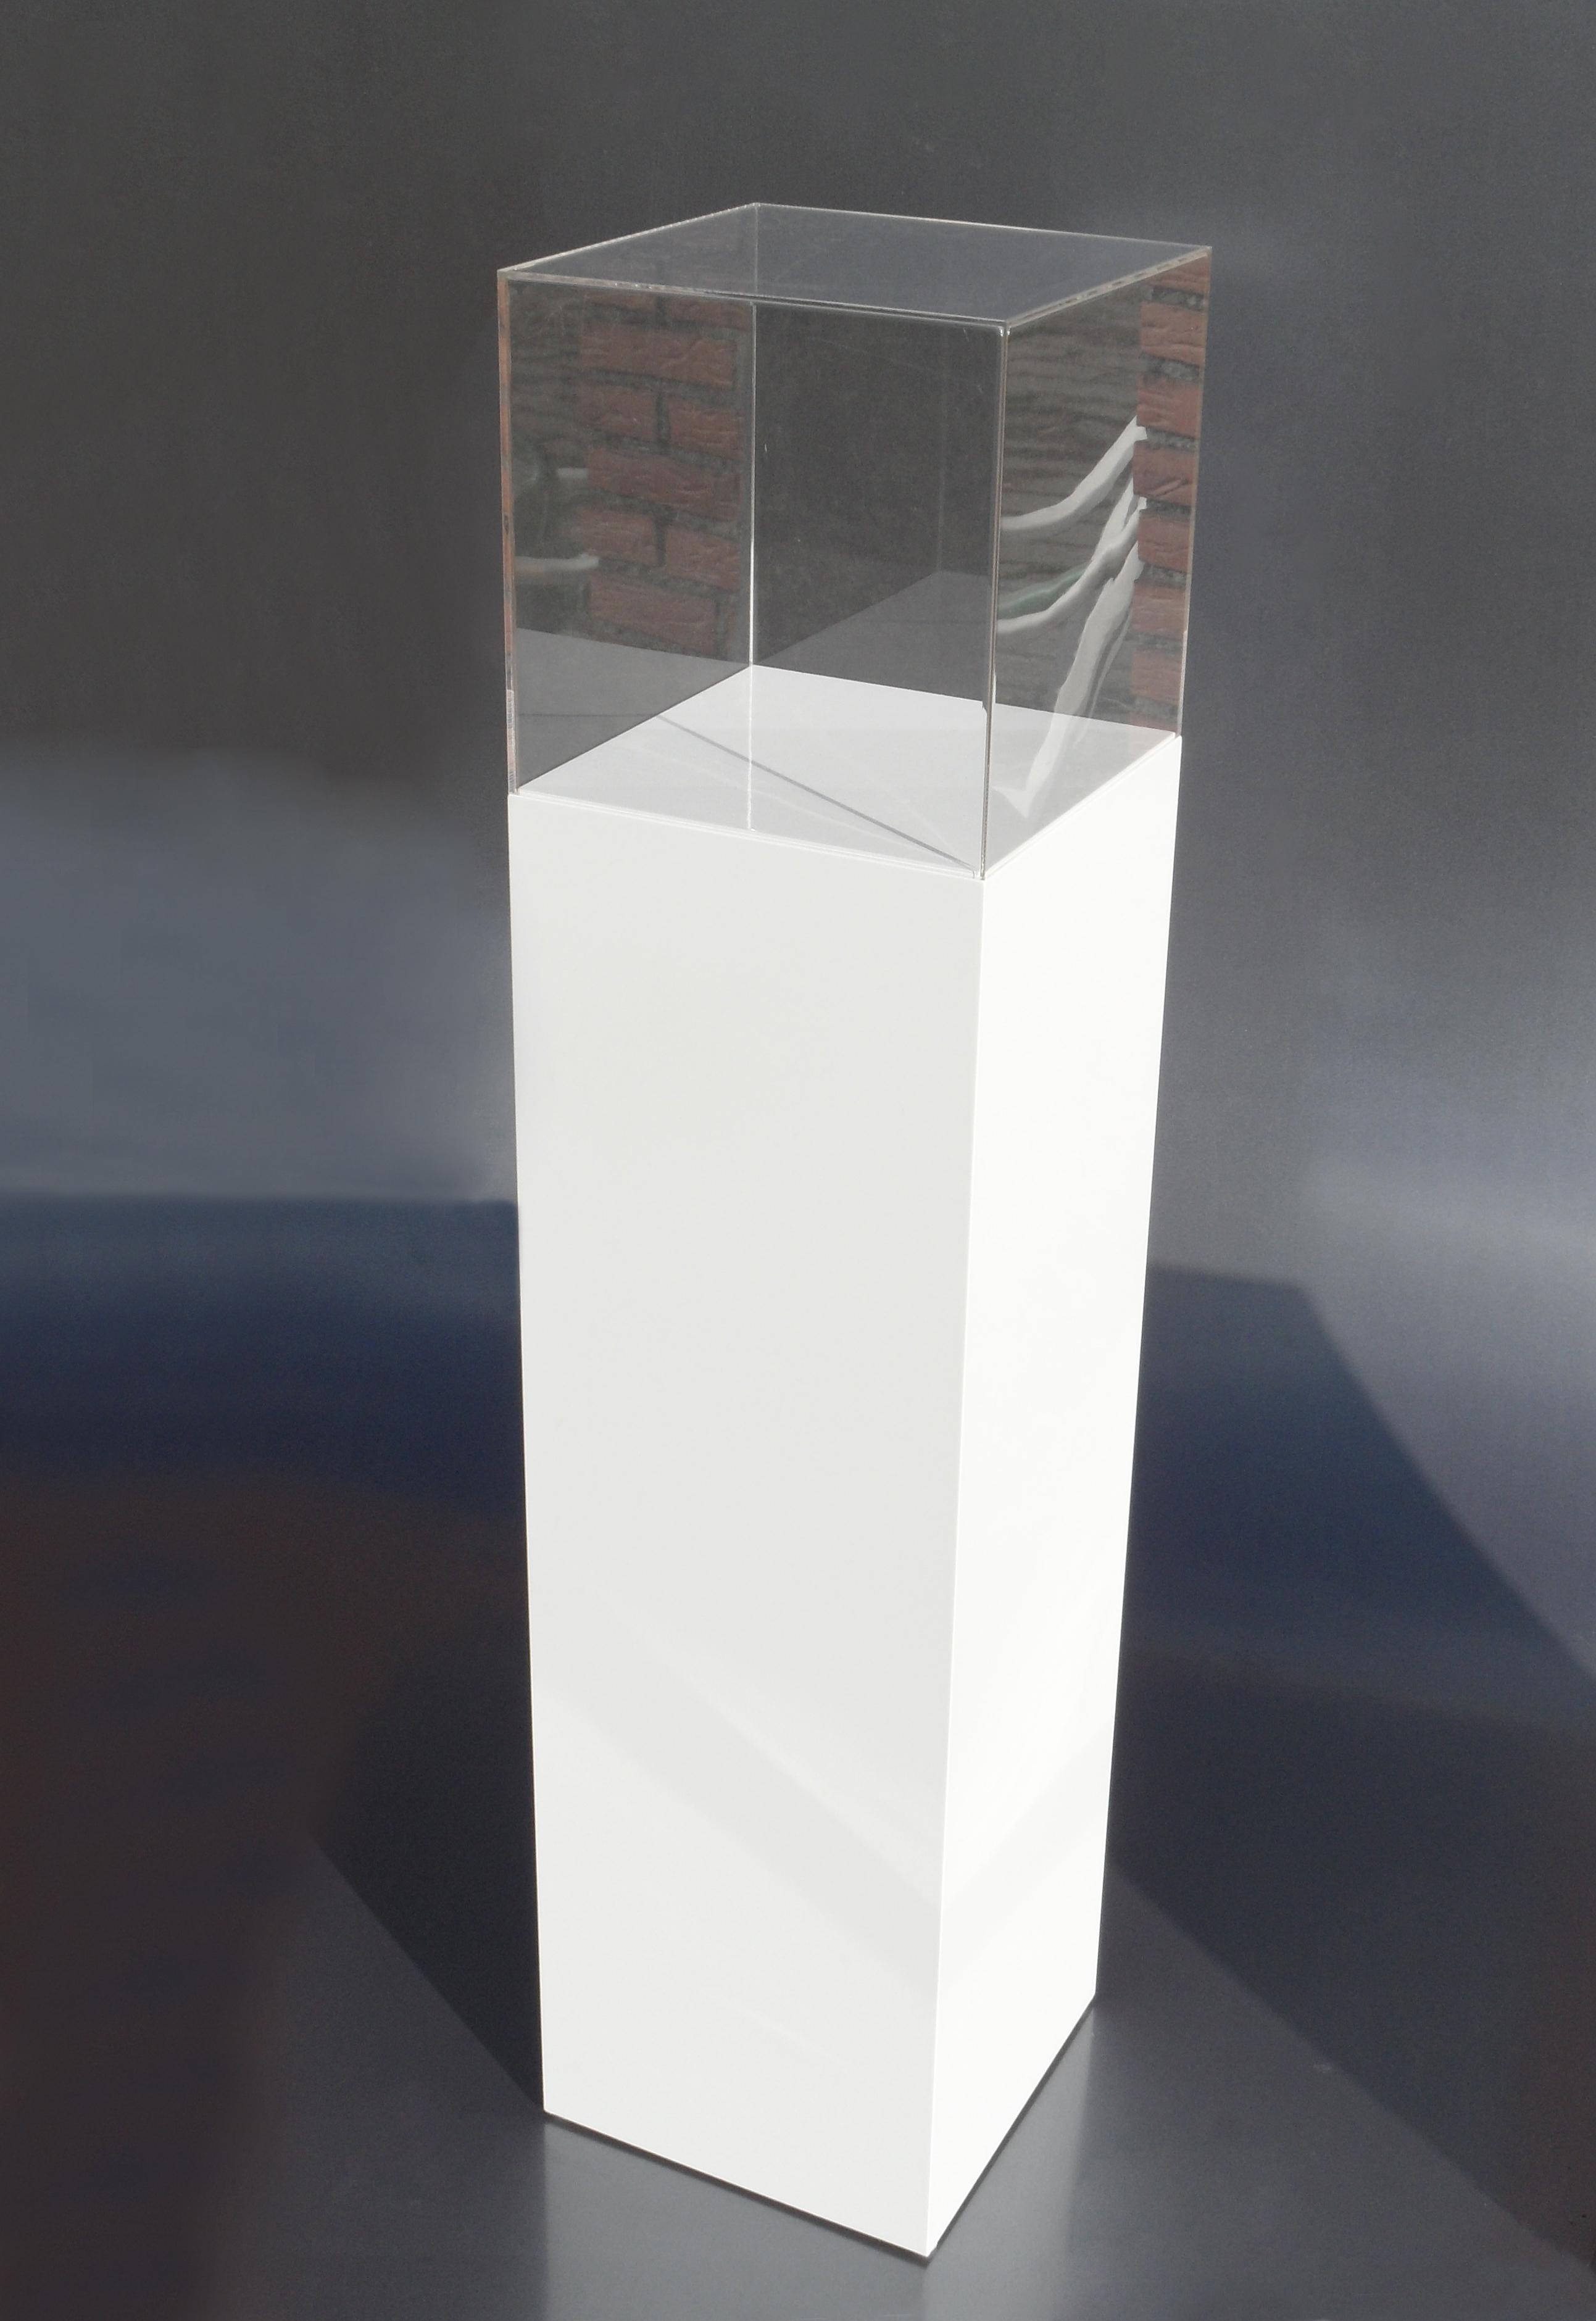 sokkel met plexiglazen kap-30x30x130